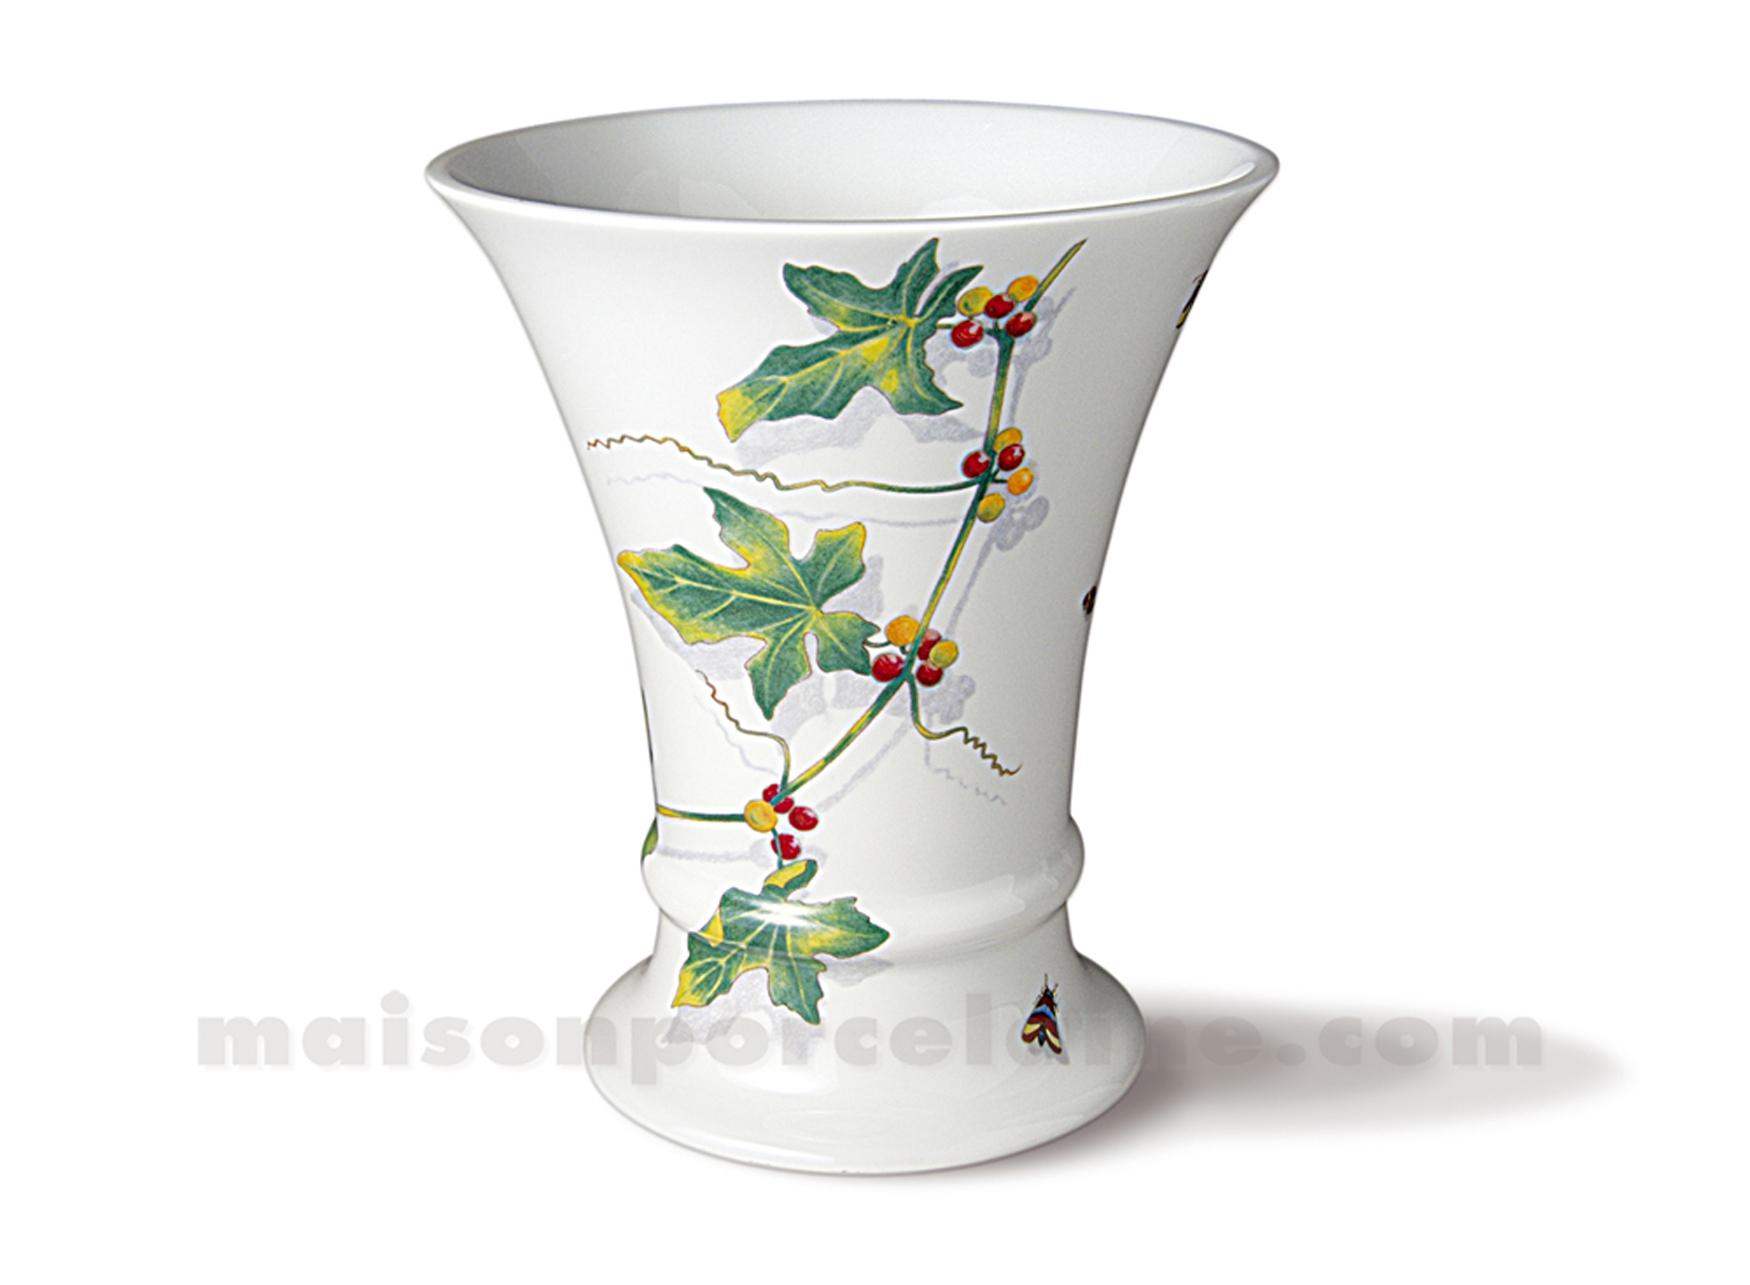 vase limoges empire gm h20 maison de la porcelaine. Black Bedroom Furniture Sets. Home Design Ideas